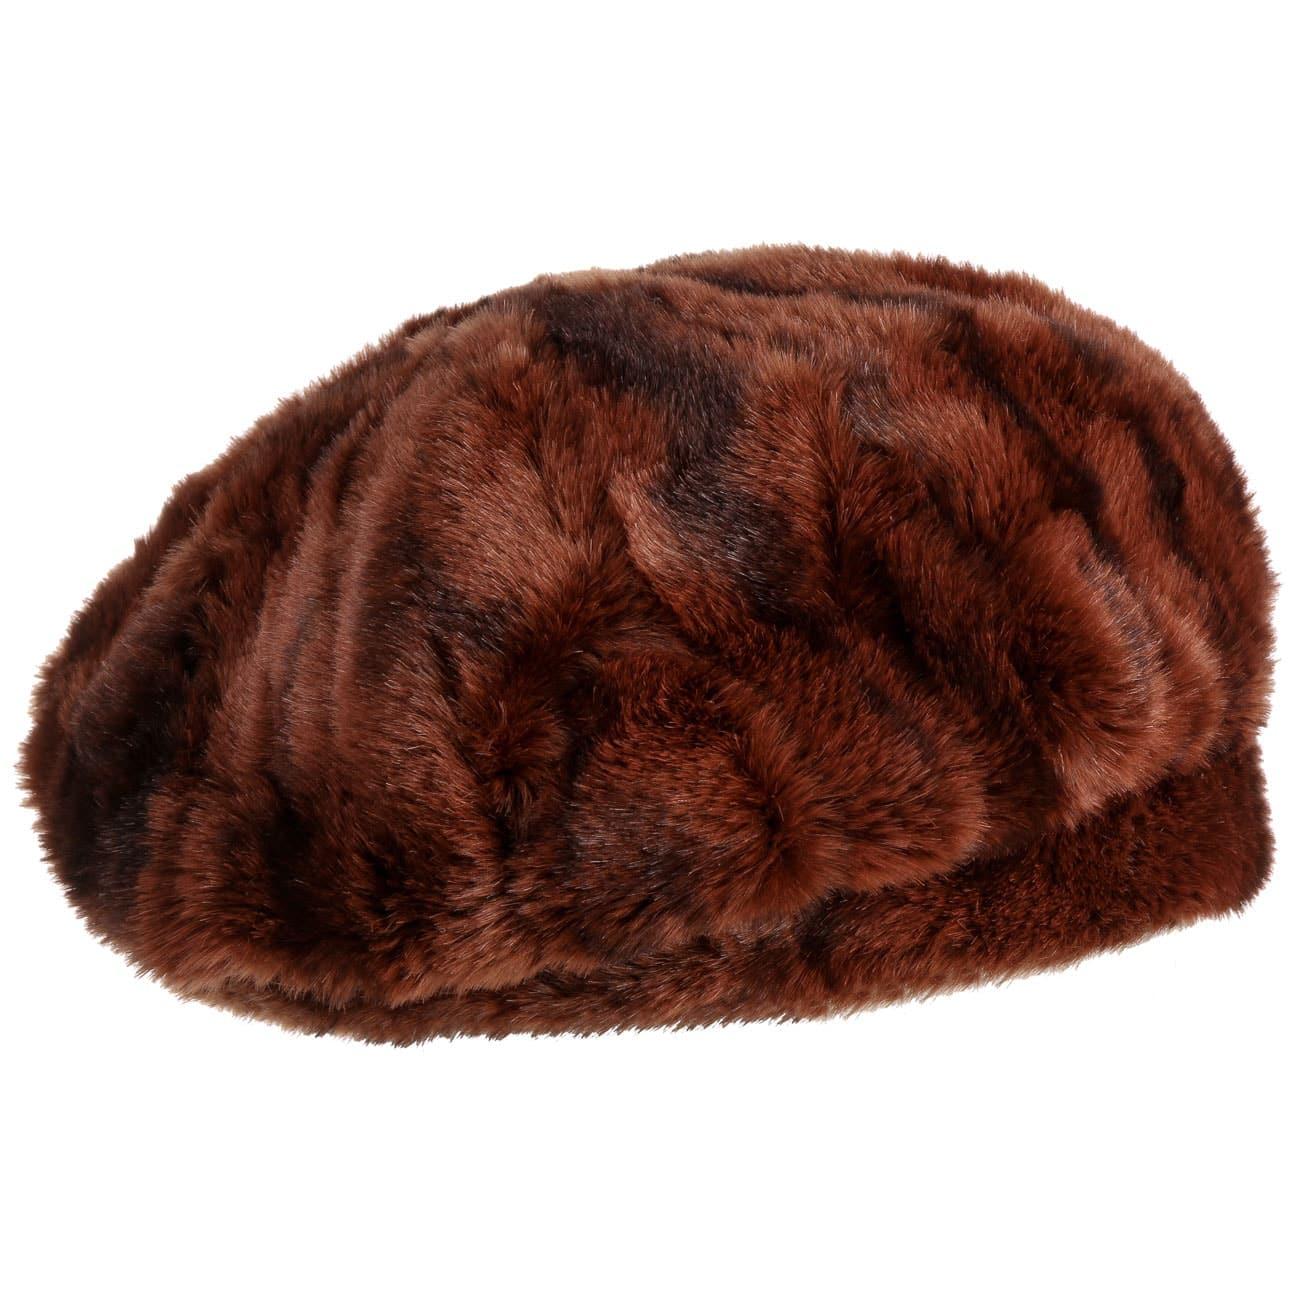 Boina Cognac Fake Fur by Gebeana